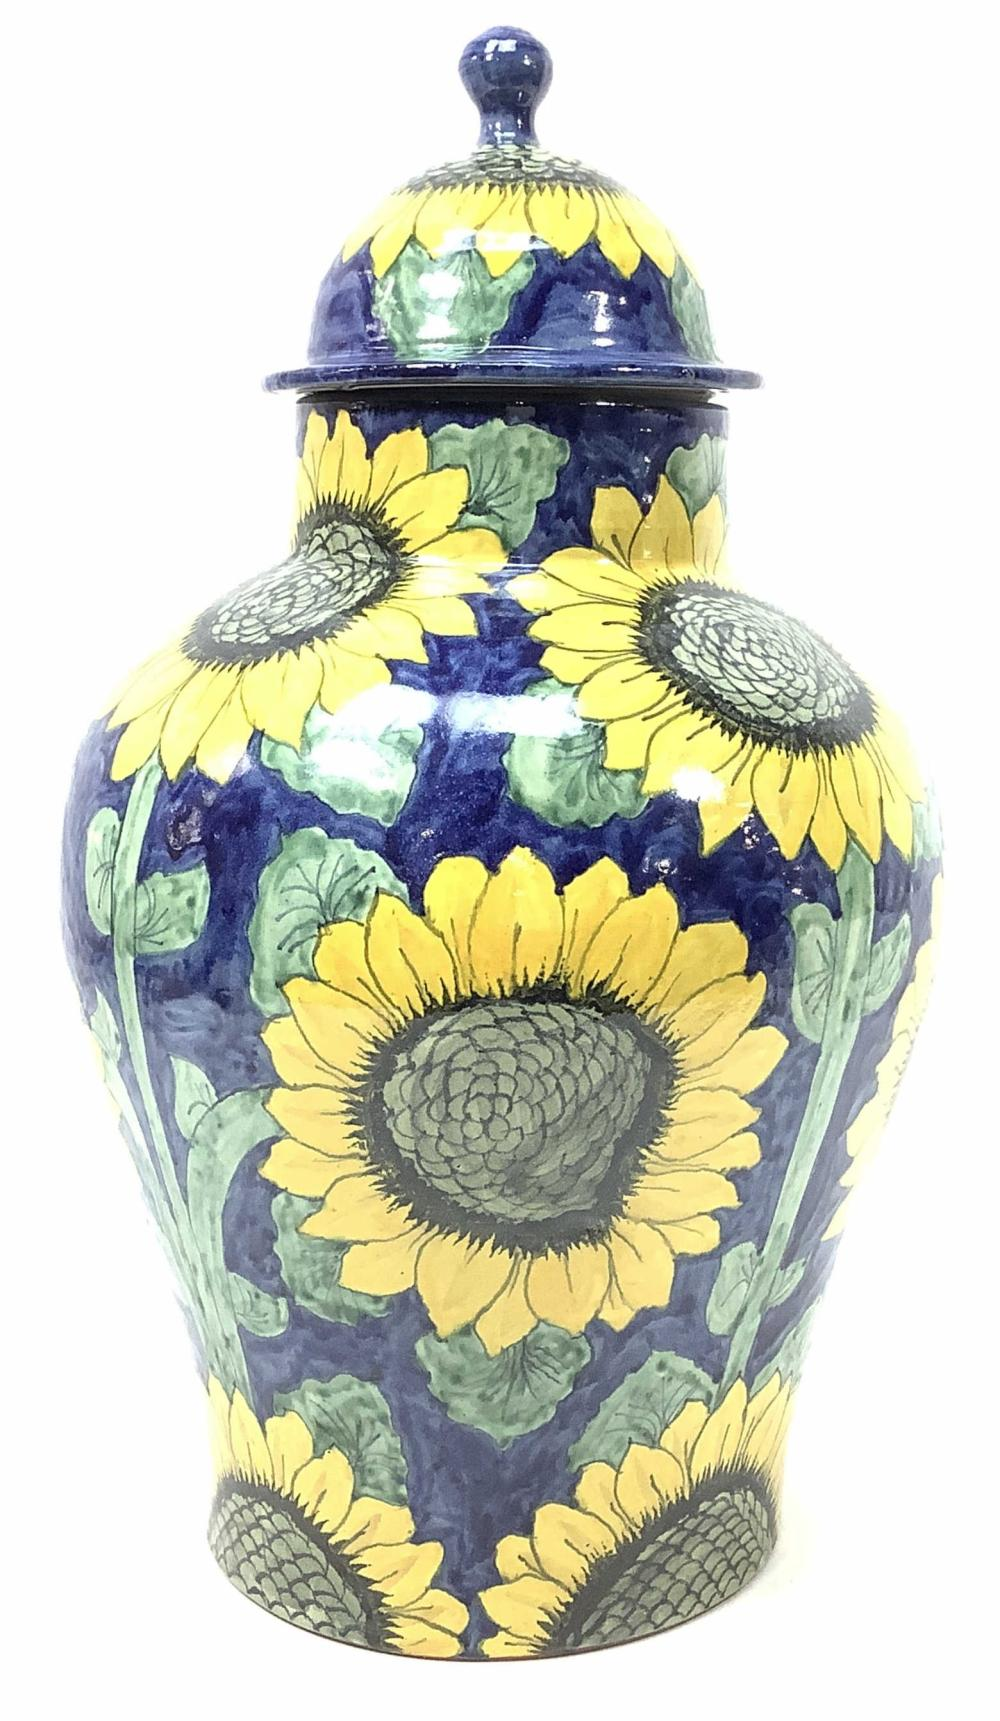 Lot - Amora Mexico Ceramic Lidded Sunflower Urn